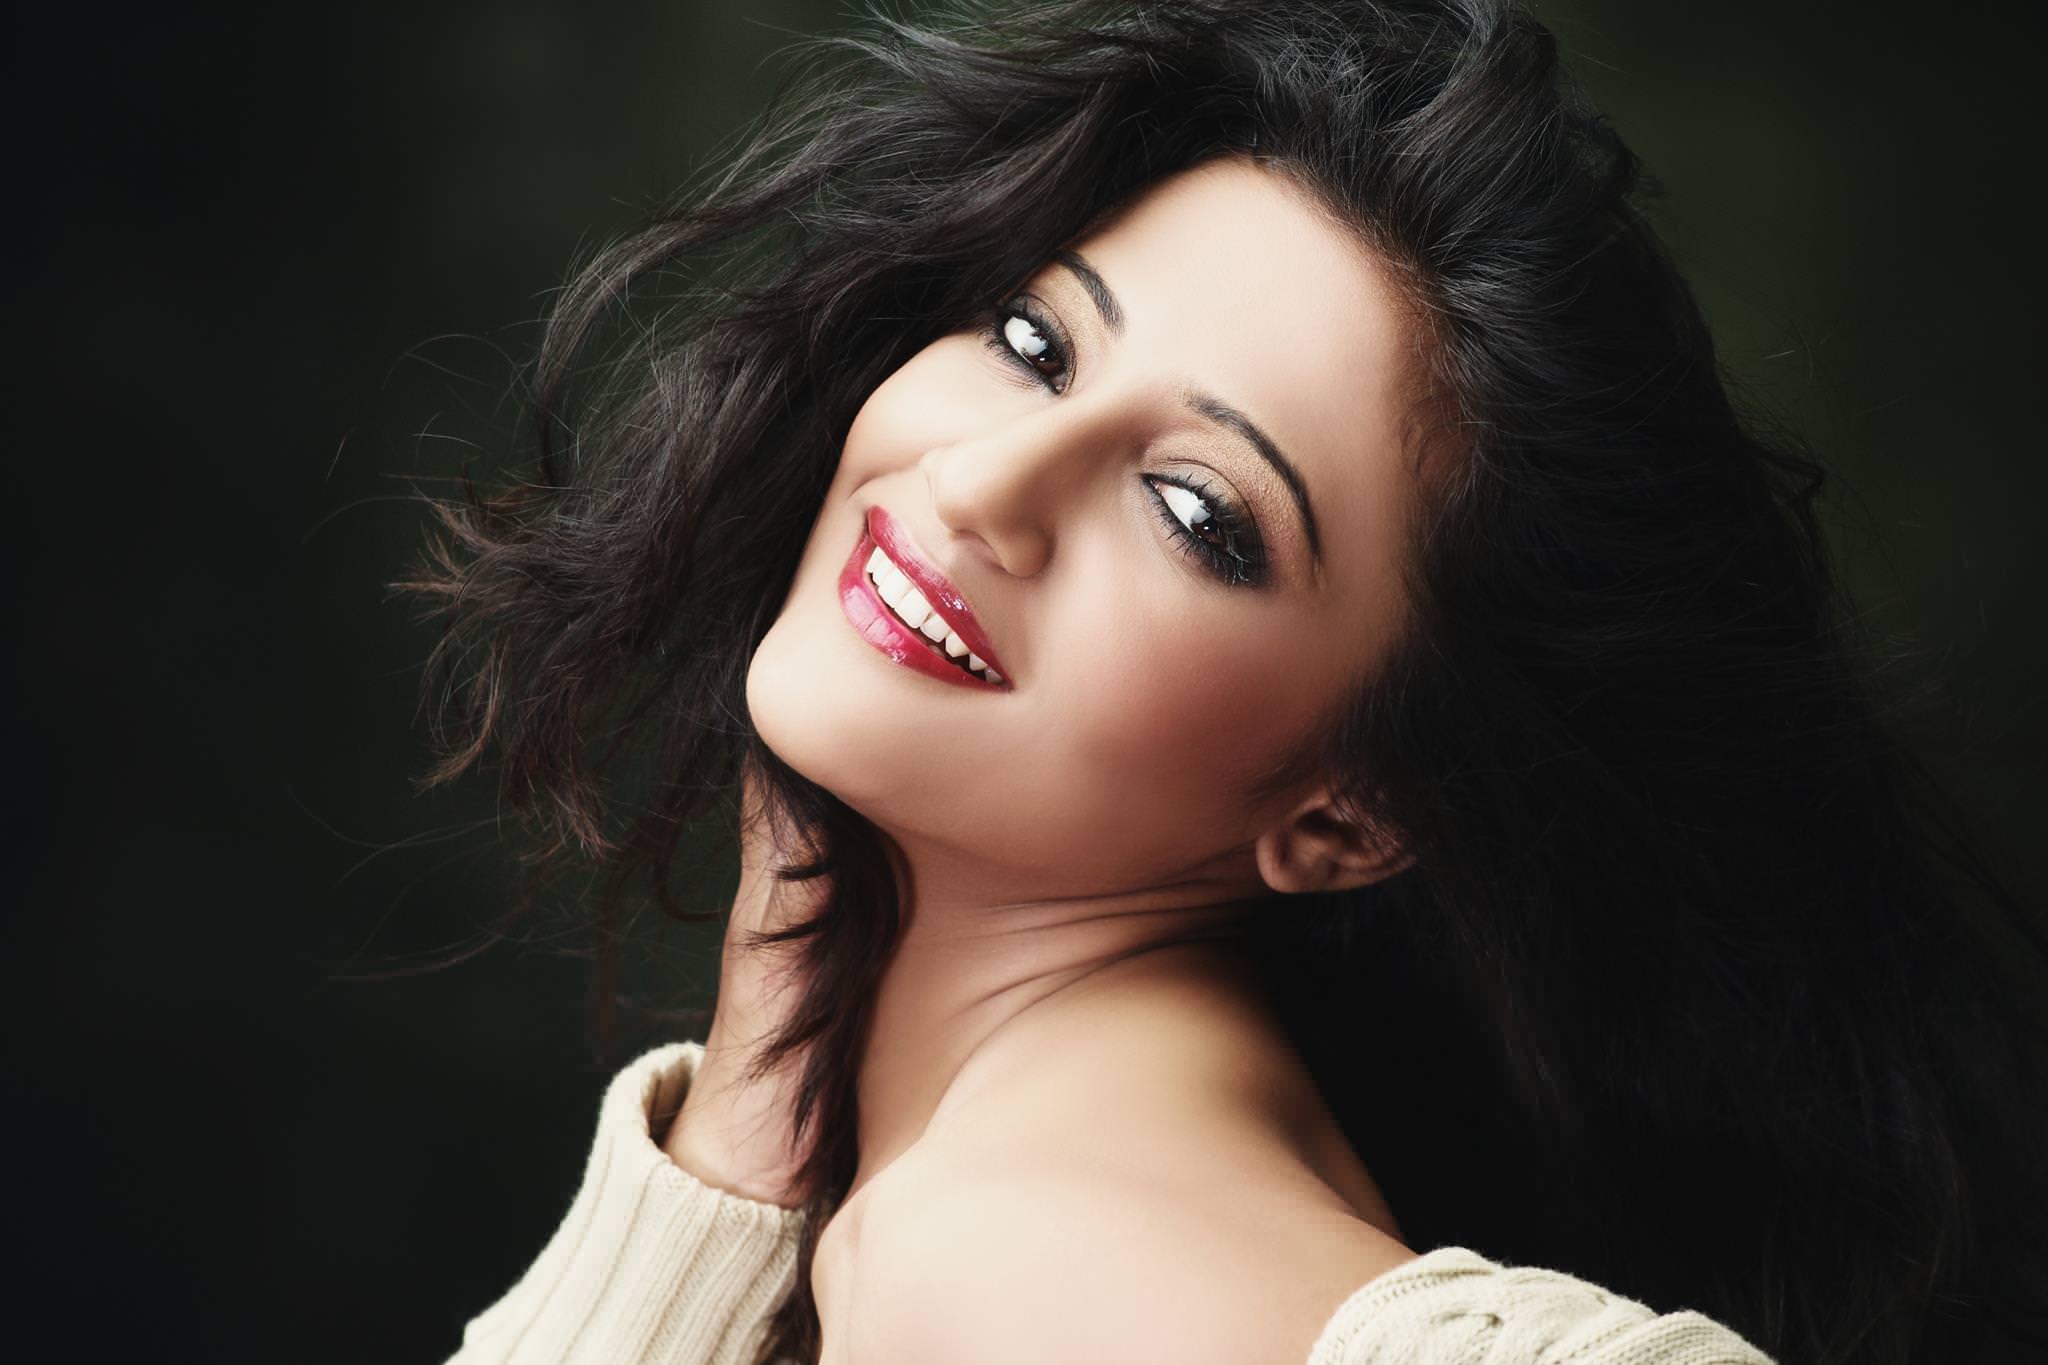 Radhika apte hot marathi bolly actress exposing her pussy - 1 part 1